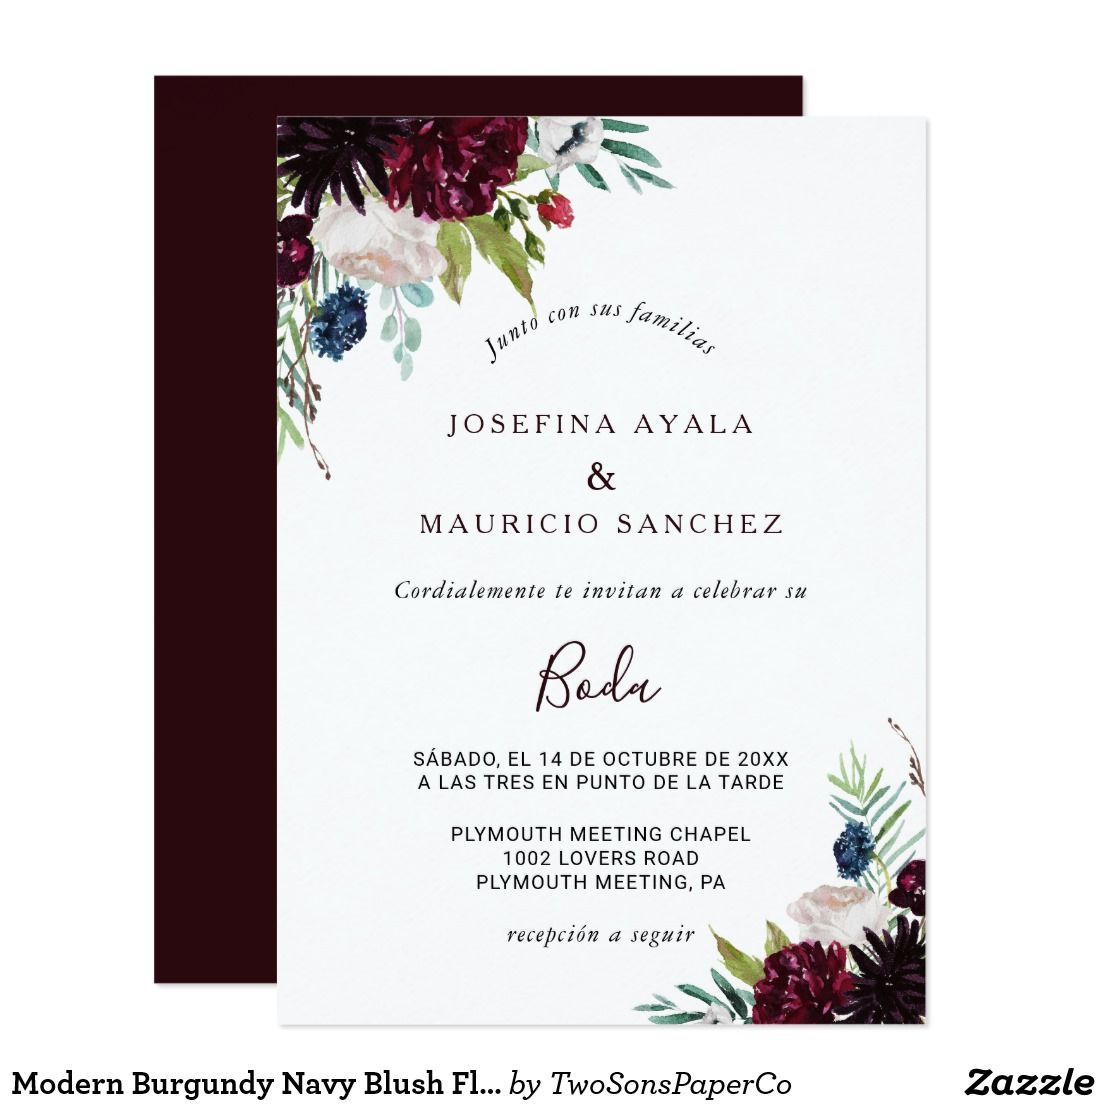 Modern burgundy navy blush floral spanish wedding